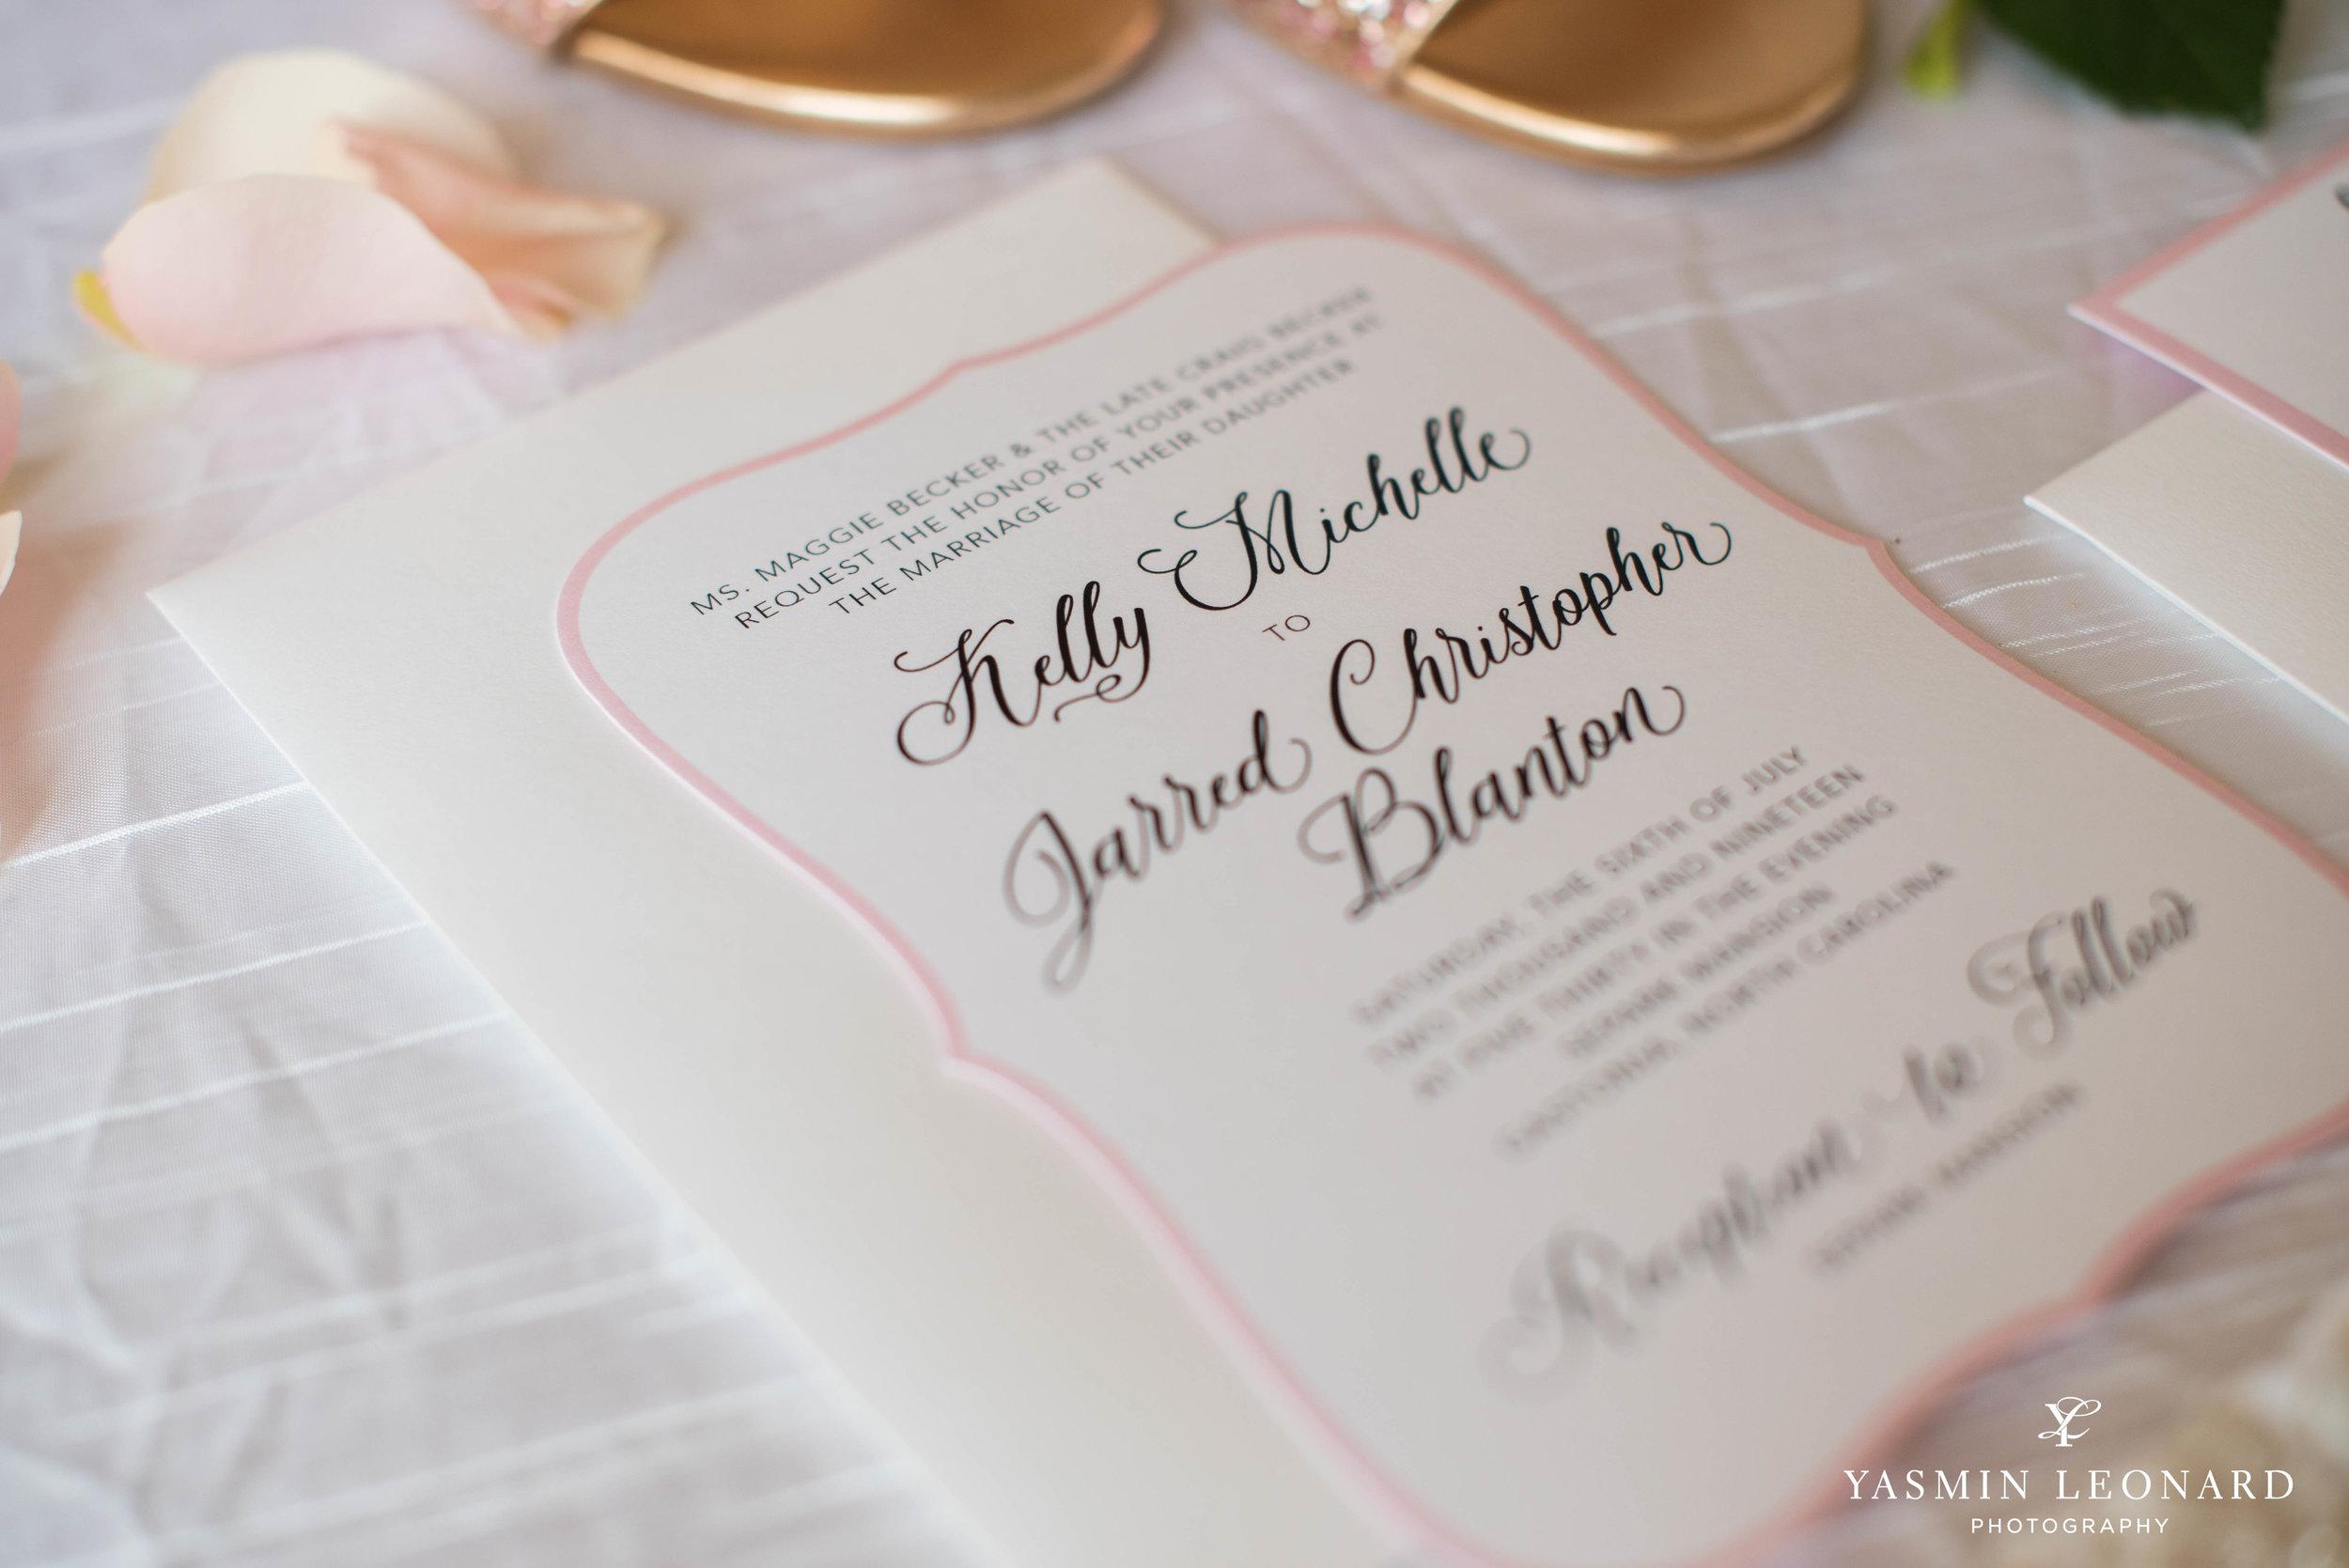 Separk Mansion - NC Weddings - Gastonia Wedding - NC Wedding Venues - Pink and Blue Wedding Ideas - Pink Bridesmaid Dresses - Yasmin Leonard Photography-4.jpg